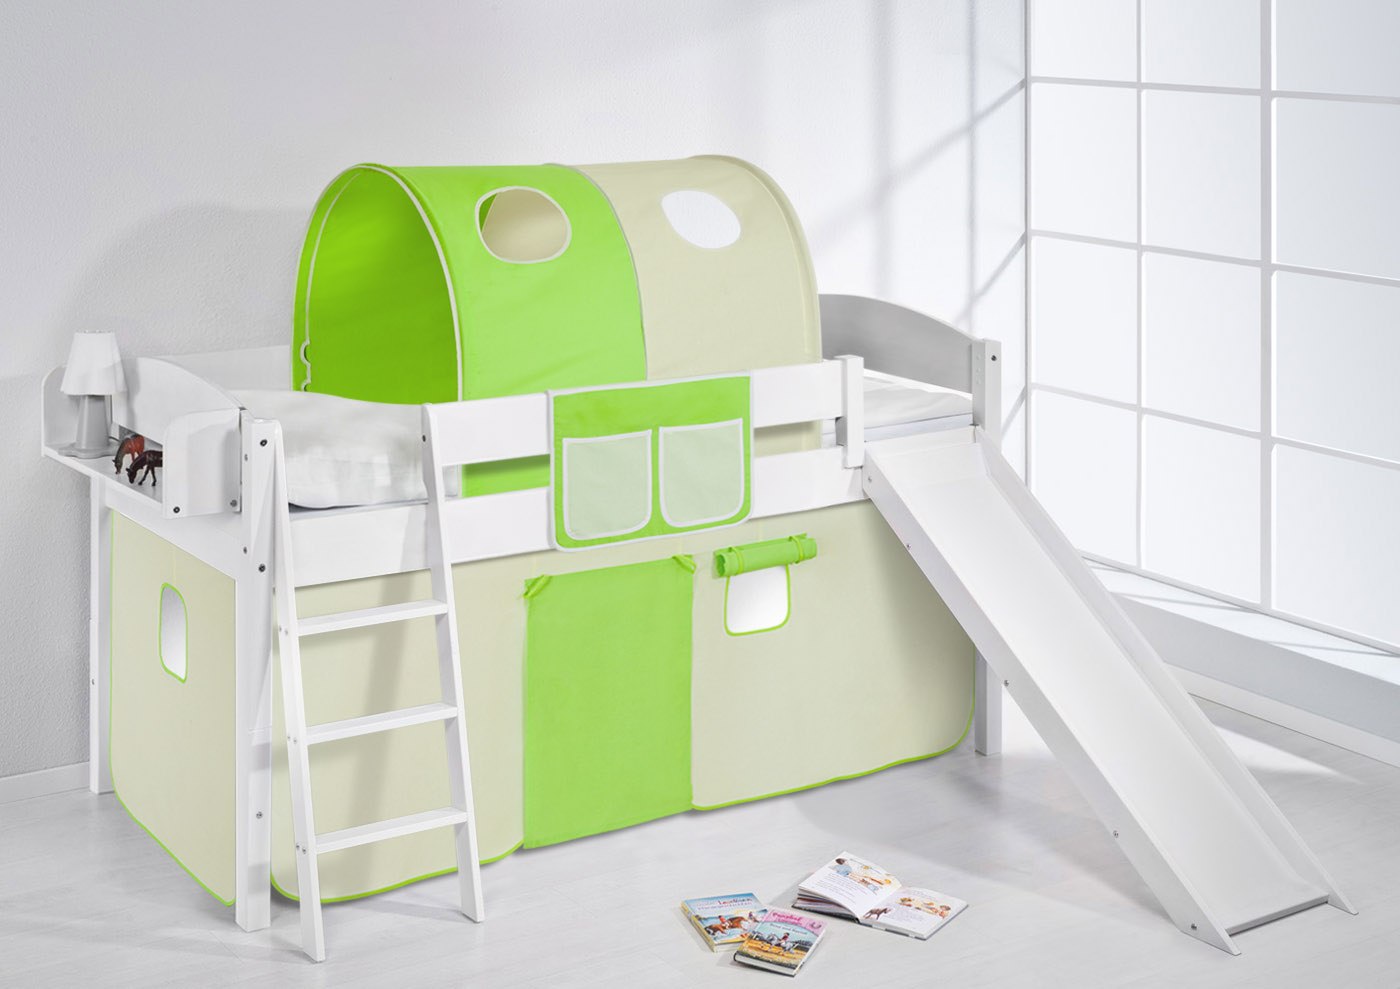 spielbett hochbett etagenbett massiv mit rutsche neu 4105. Black Bedroom Furniture Sets. Home Design Ideas